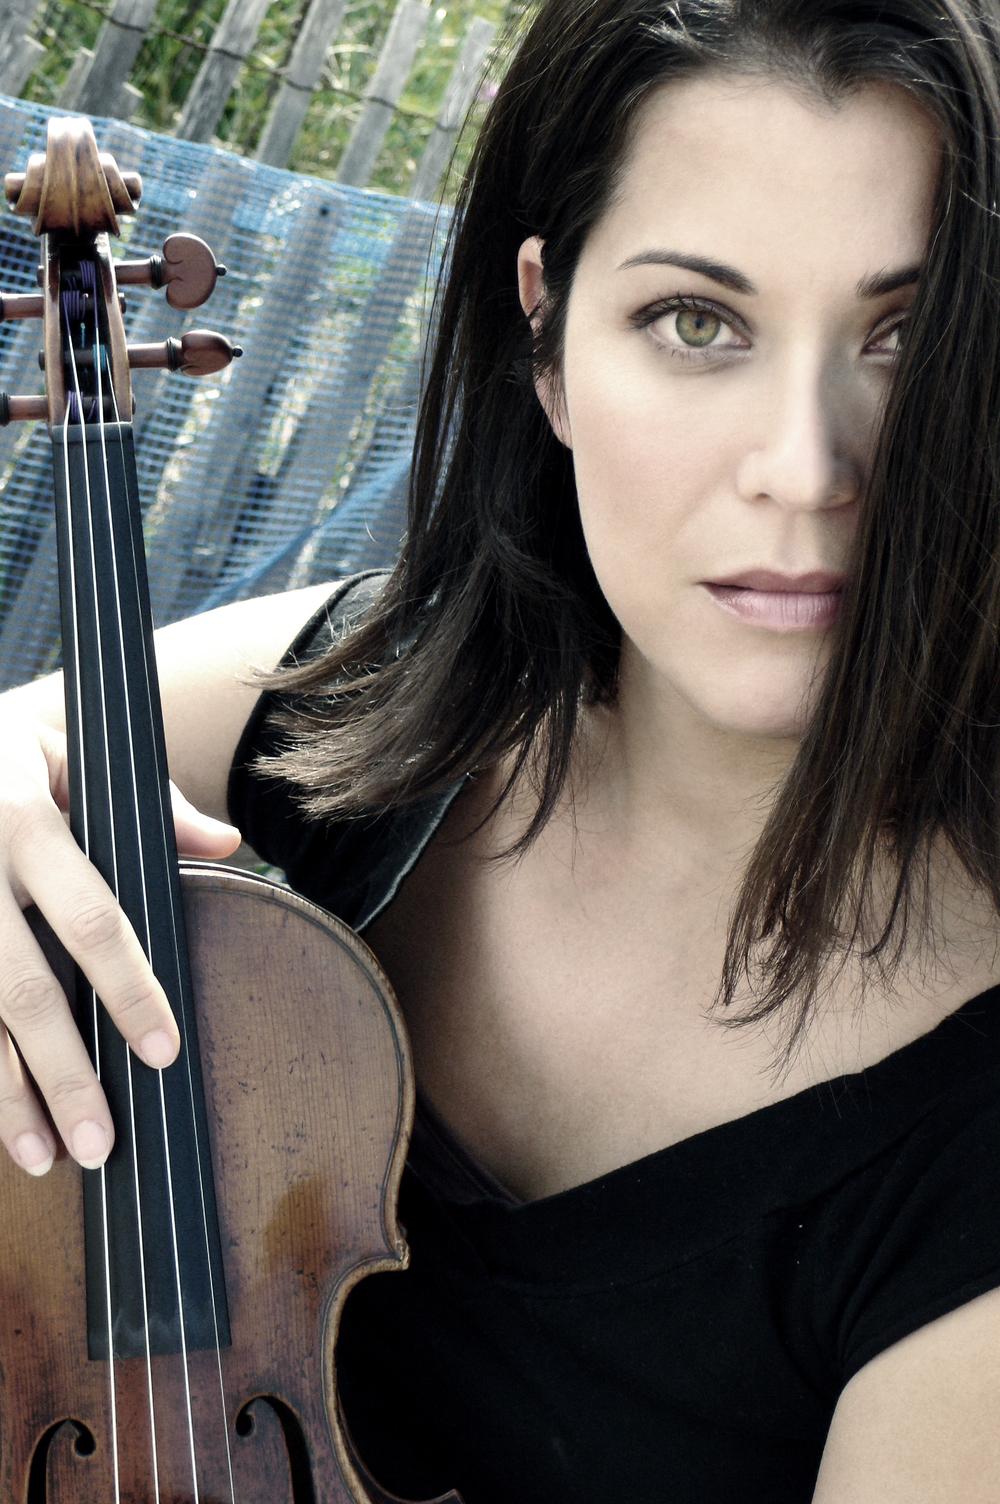 Jennifer Frautschi - photo by Lisa Marie Mazzucco